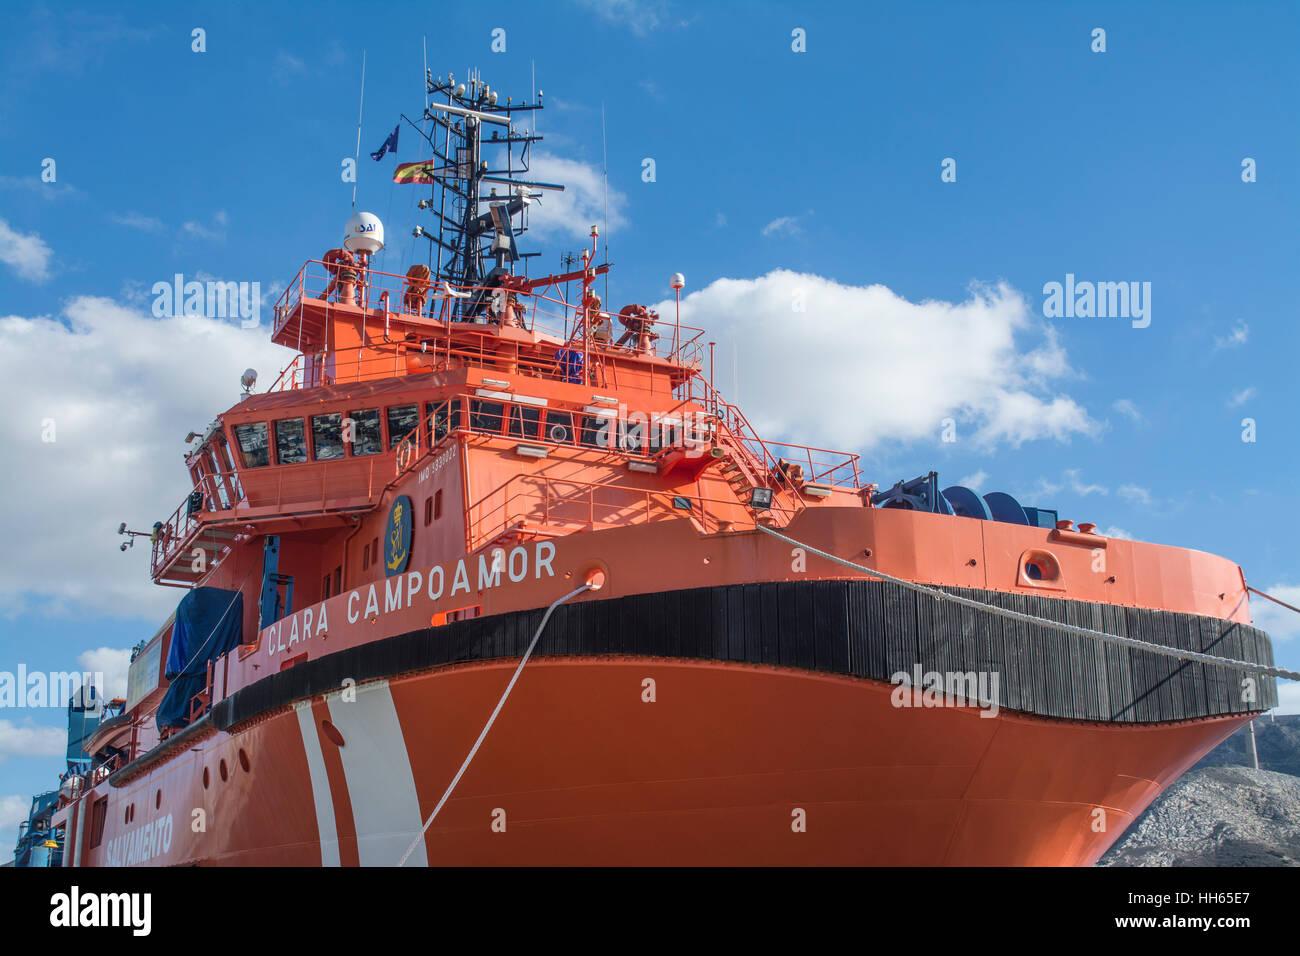 Clara Campoamor resuce vessel moared in the marina of Cartagena in Murcia Spain - Stock Image